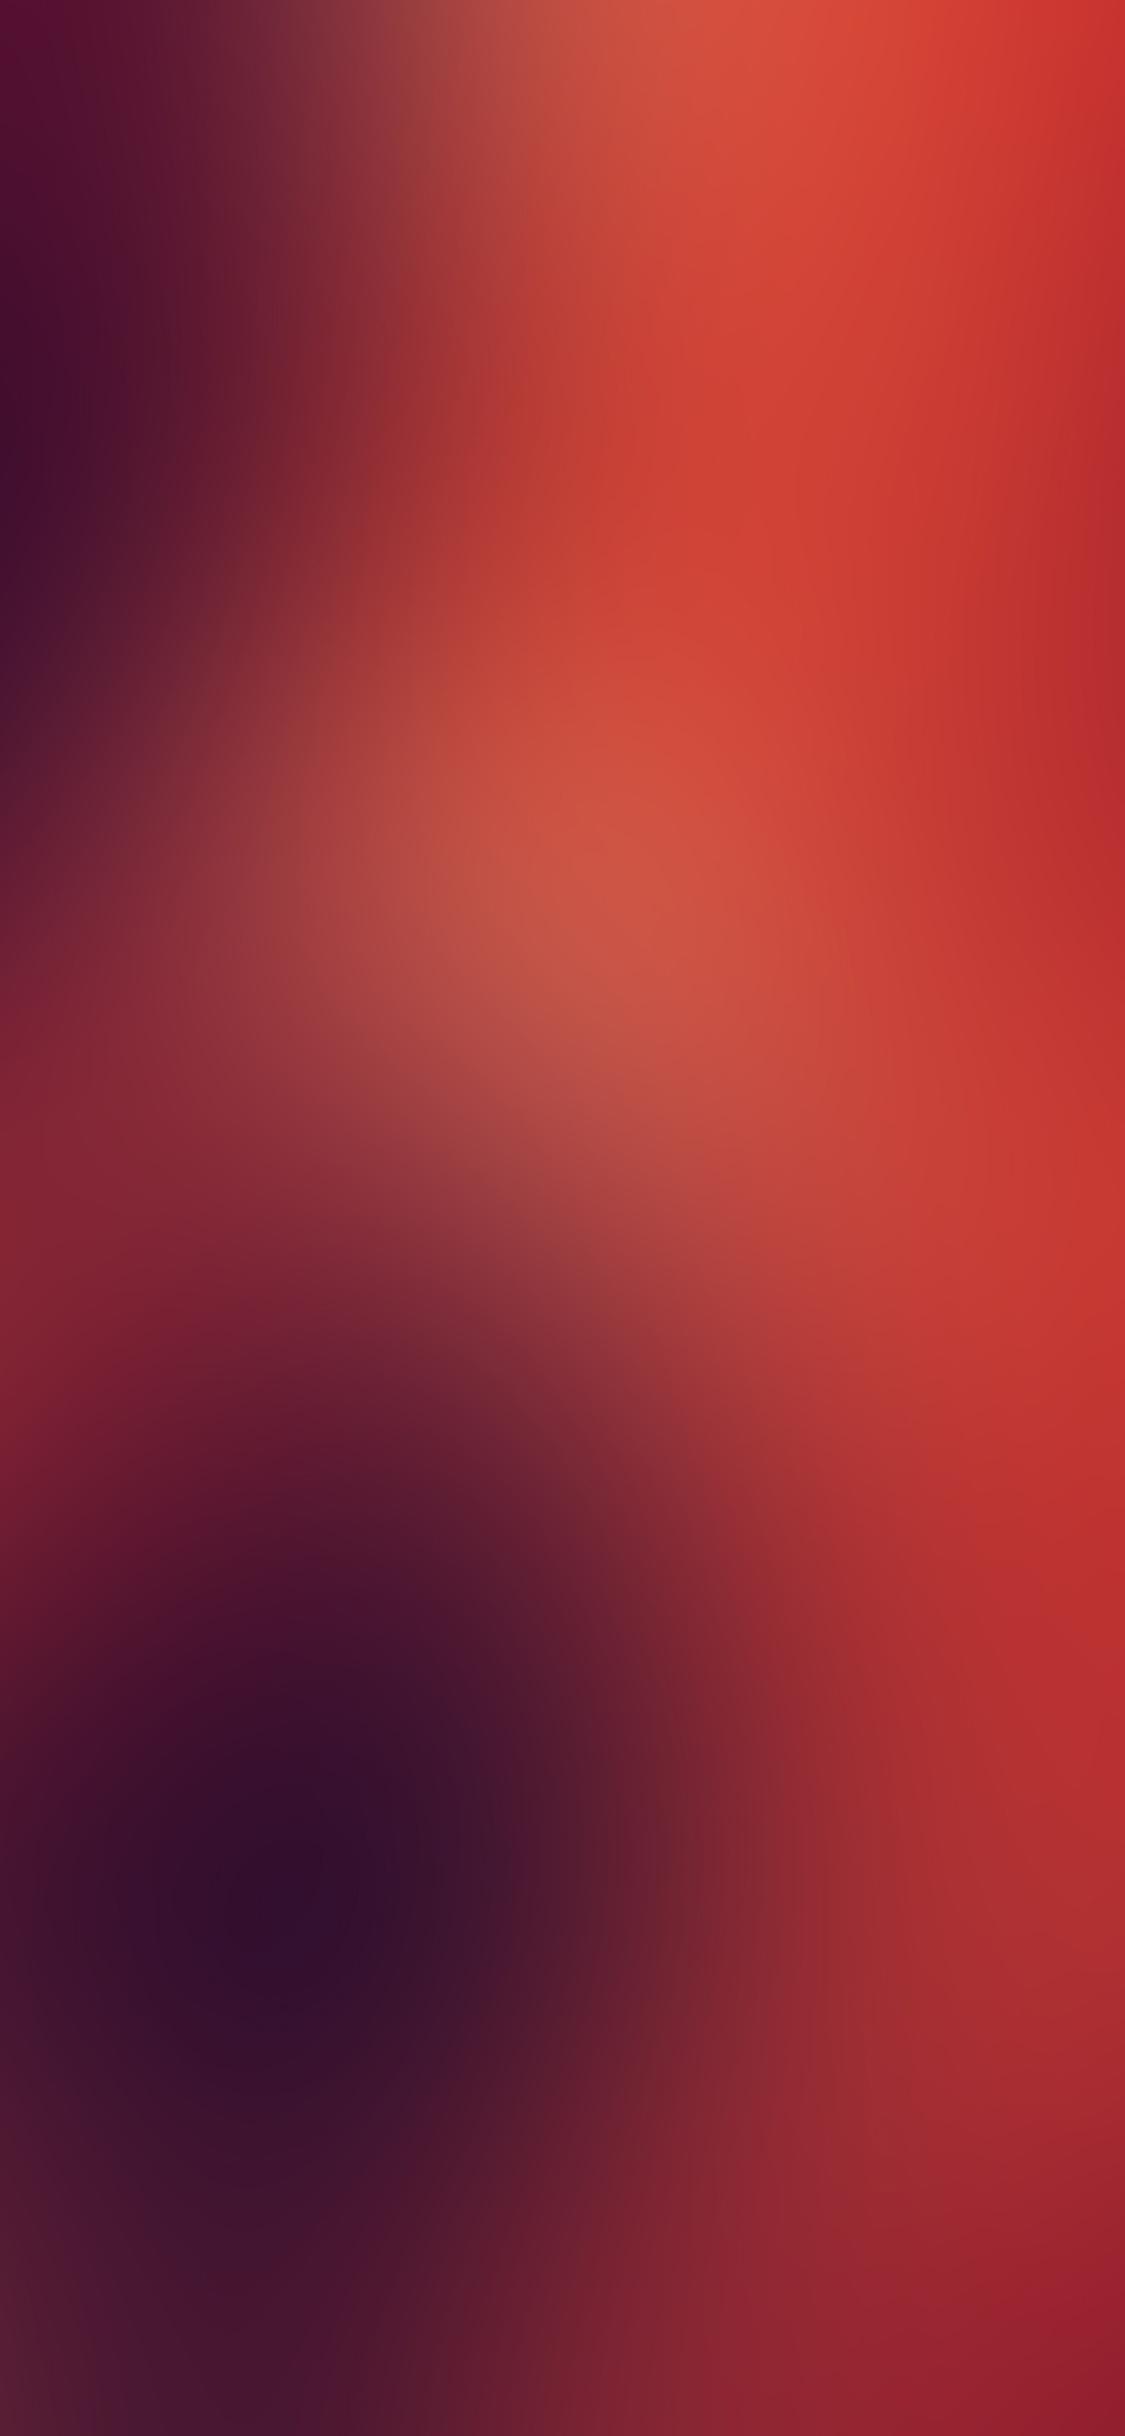 iPhoneXpapers.com-Apple-iPhone-wallpaper-sj62-orange-warm-hot-gradation-blur